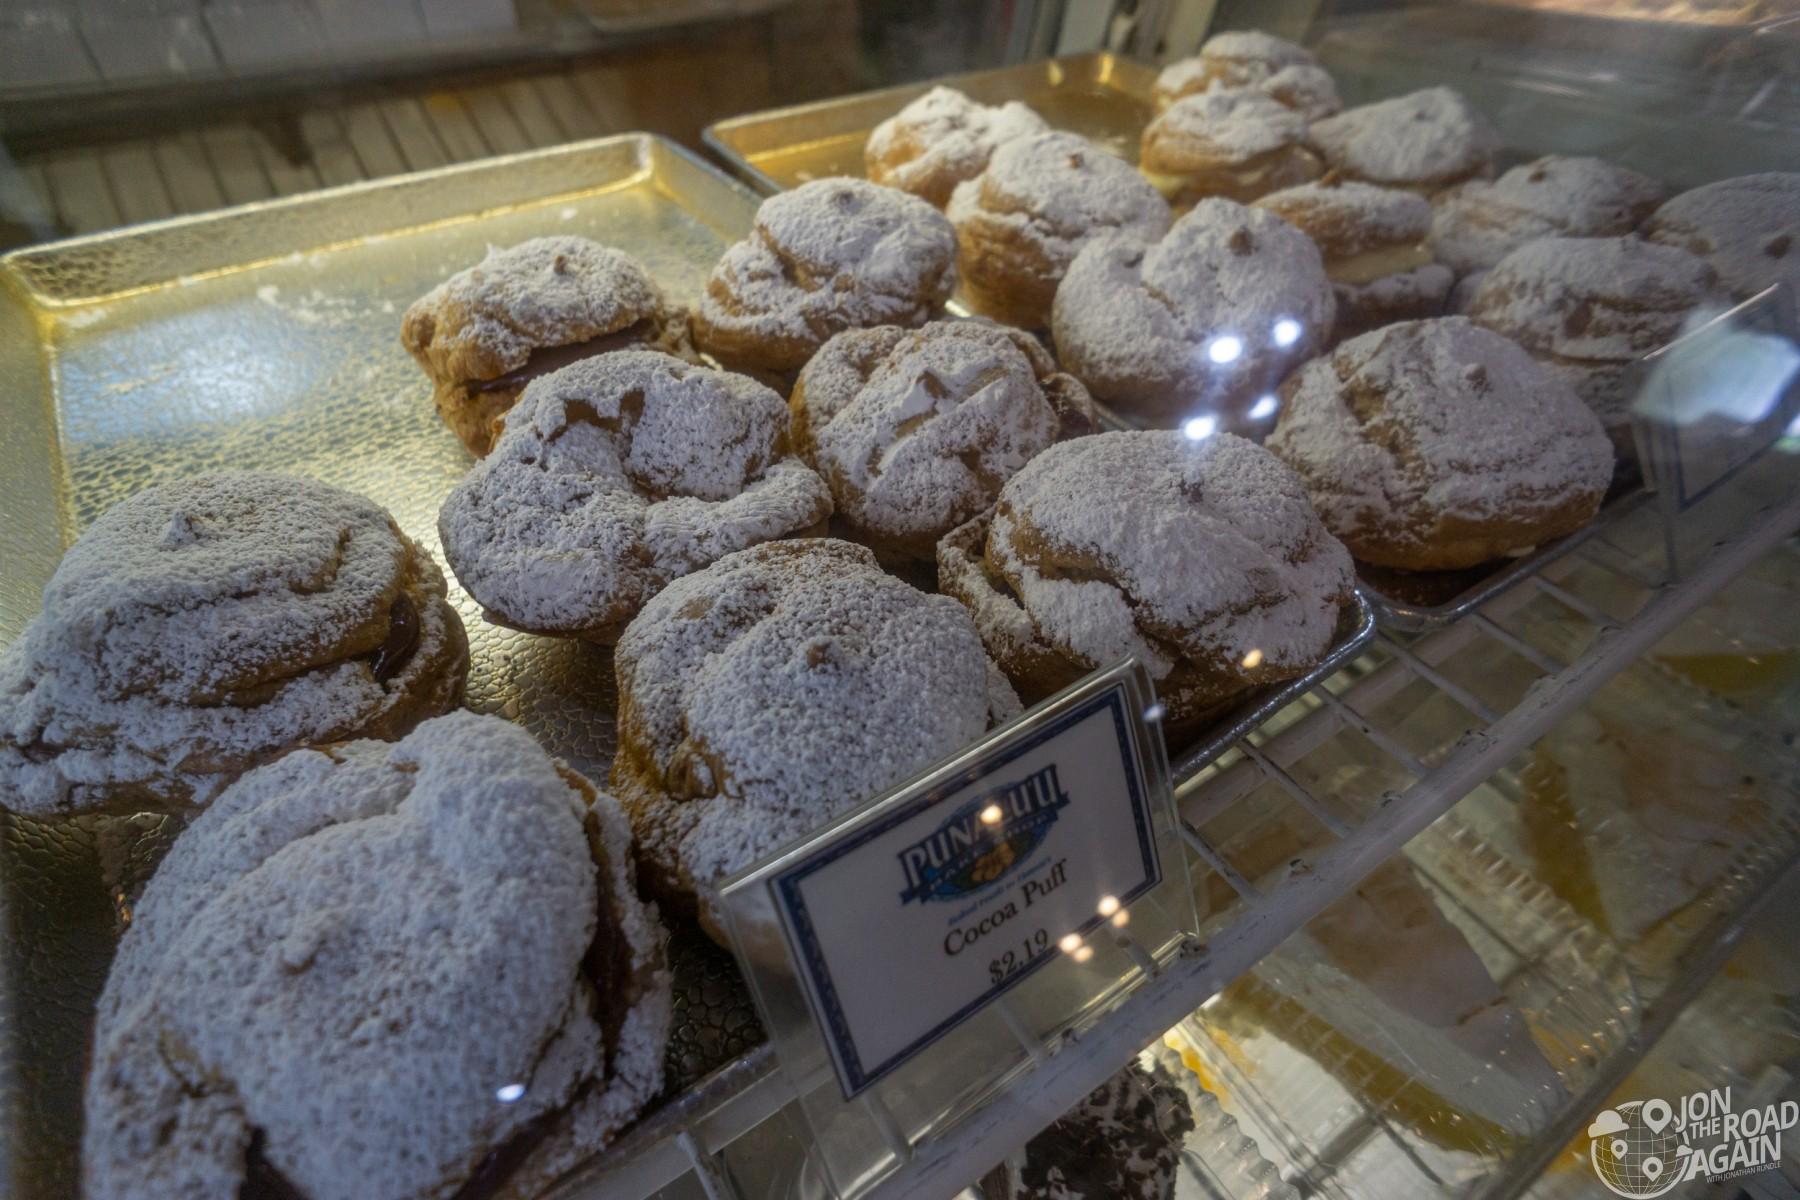 Cocoa Puffs at Punalu'u bake shop